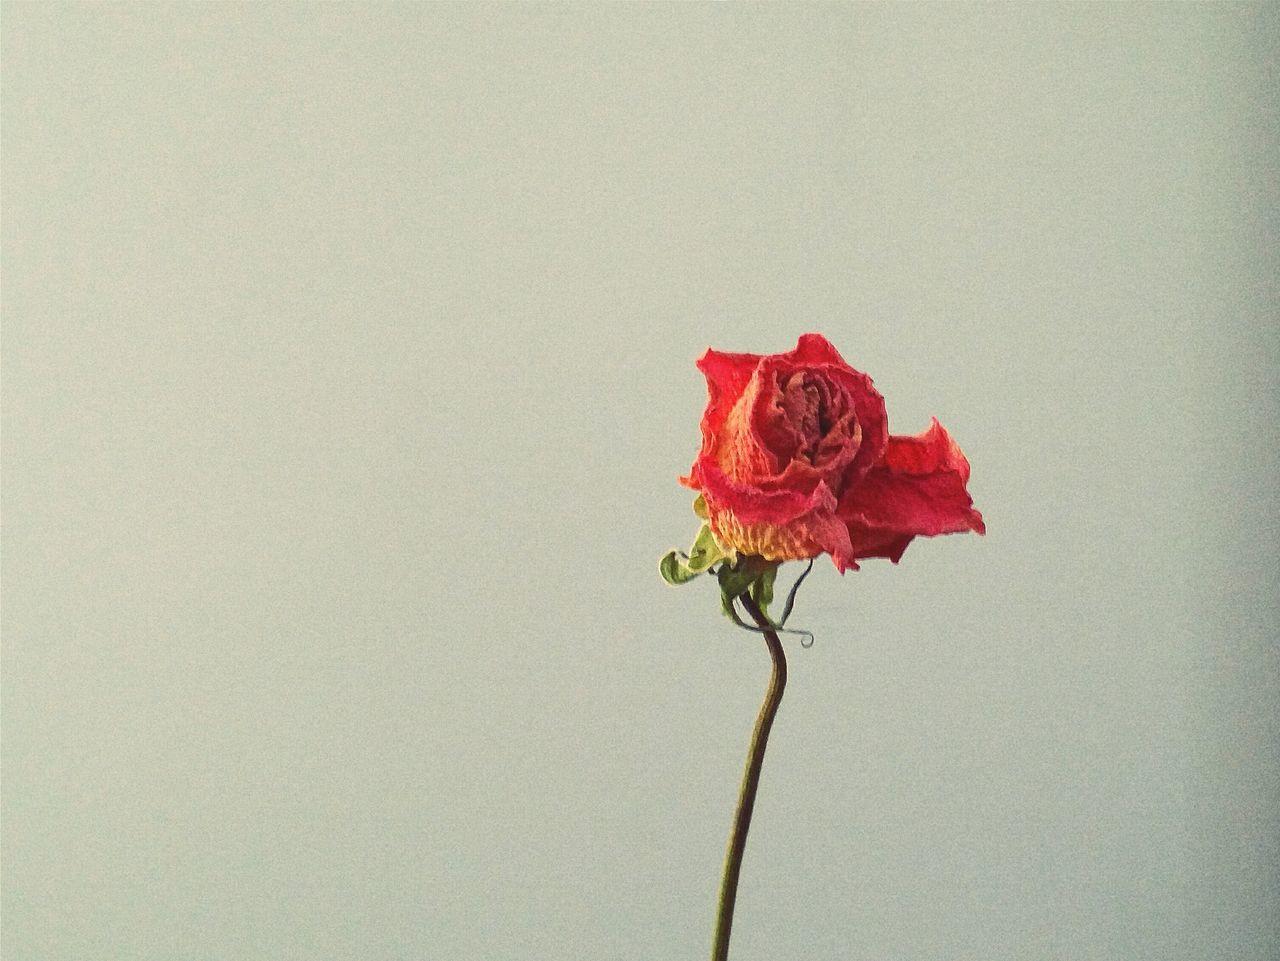 Enjoy The New Normal Flower Red Flower Head Nature Itshurt Itlookssosad Backgrounds